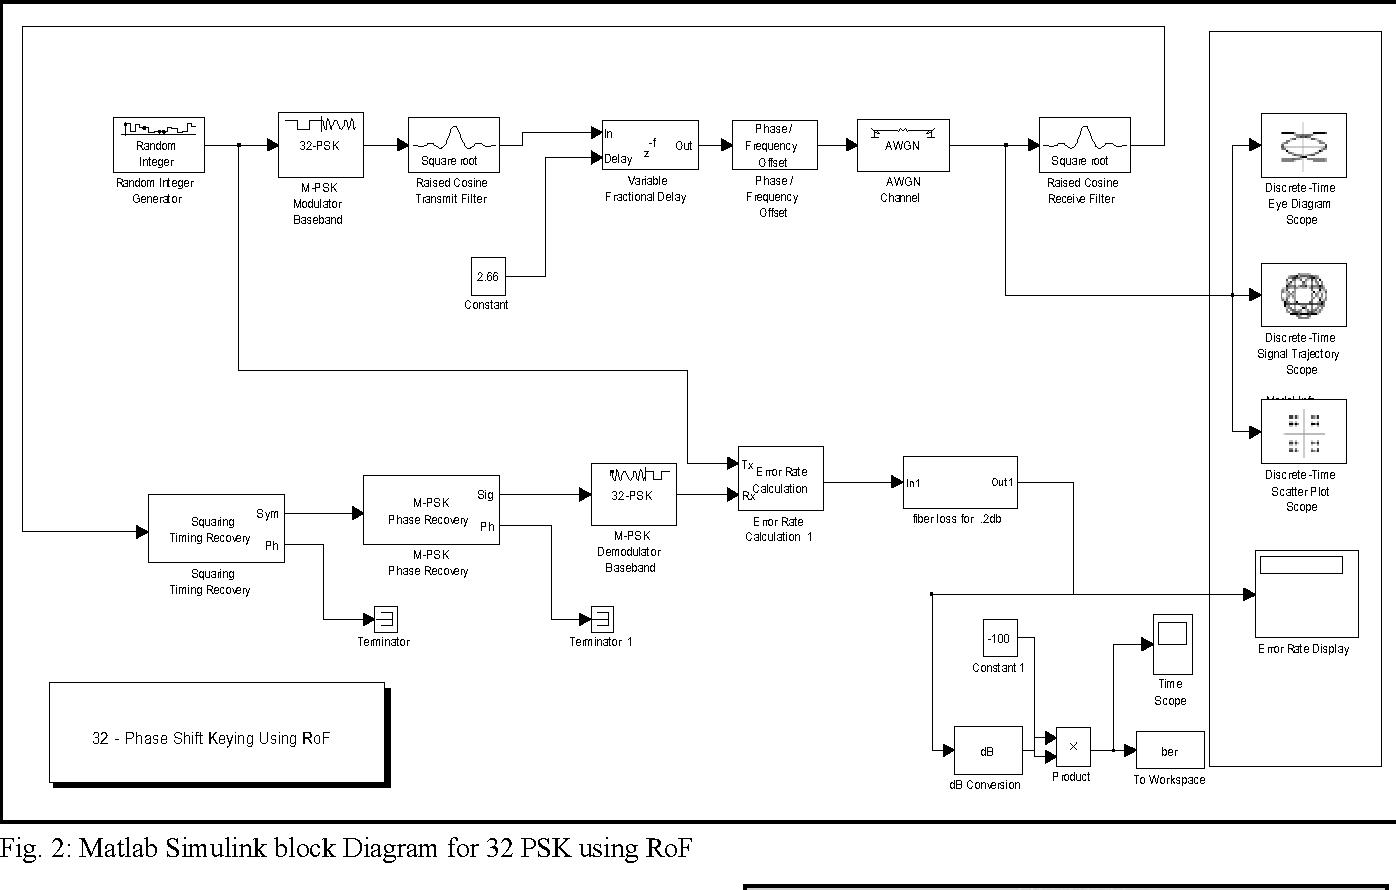 hight resolution of 2 matlab simulink block diagram for 32 psk using rof